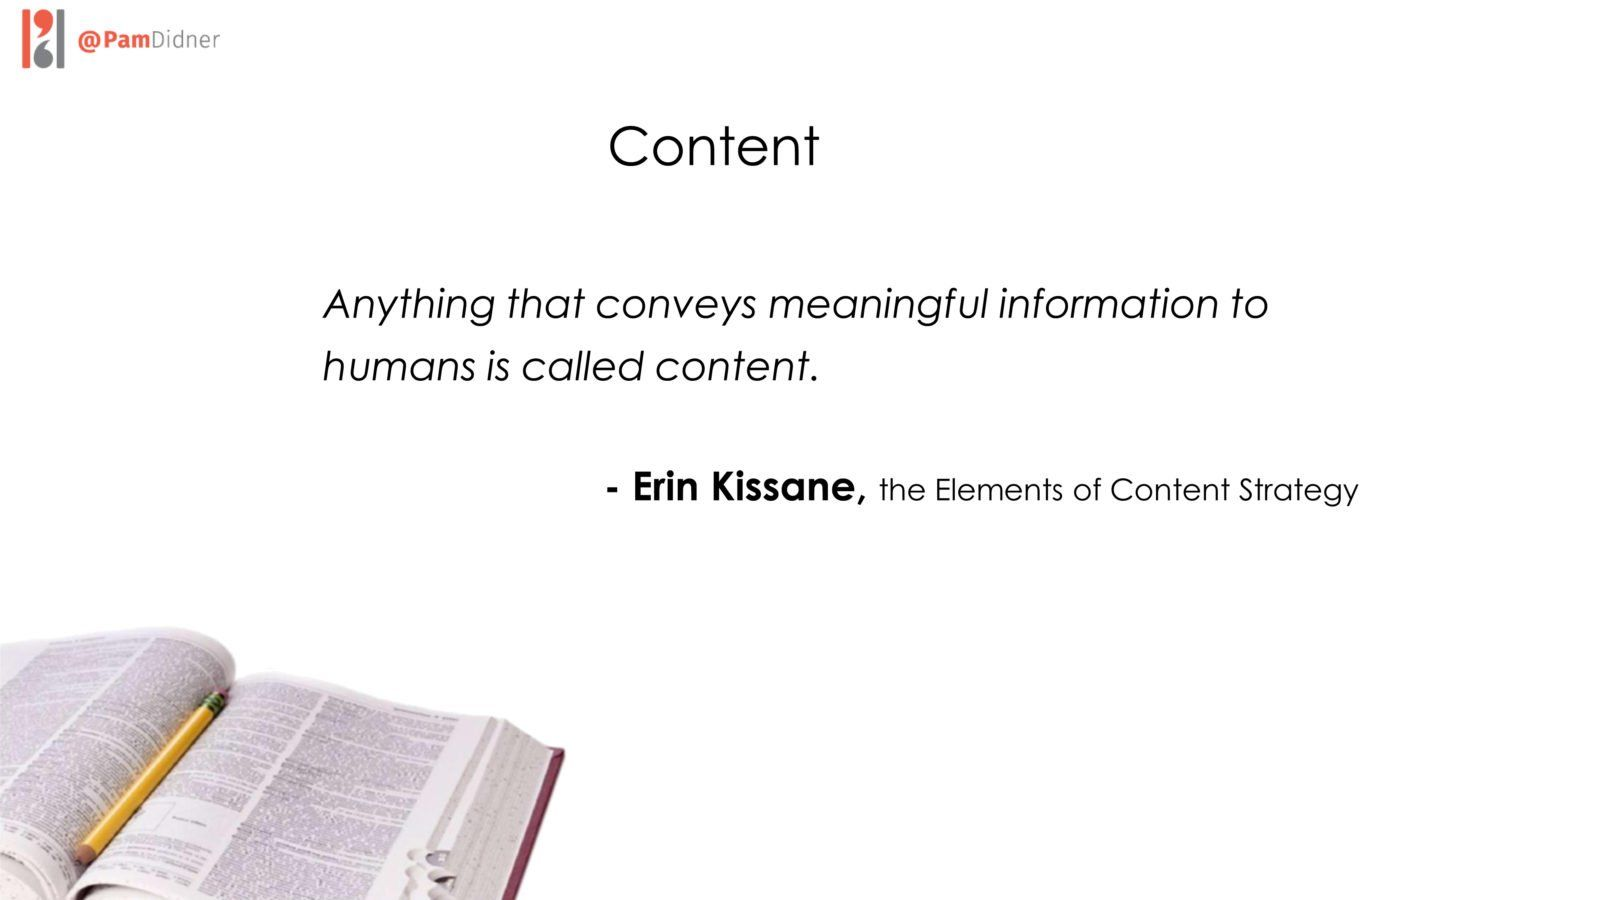 Erin Kissane Content Definition